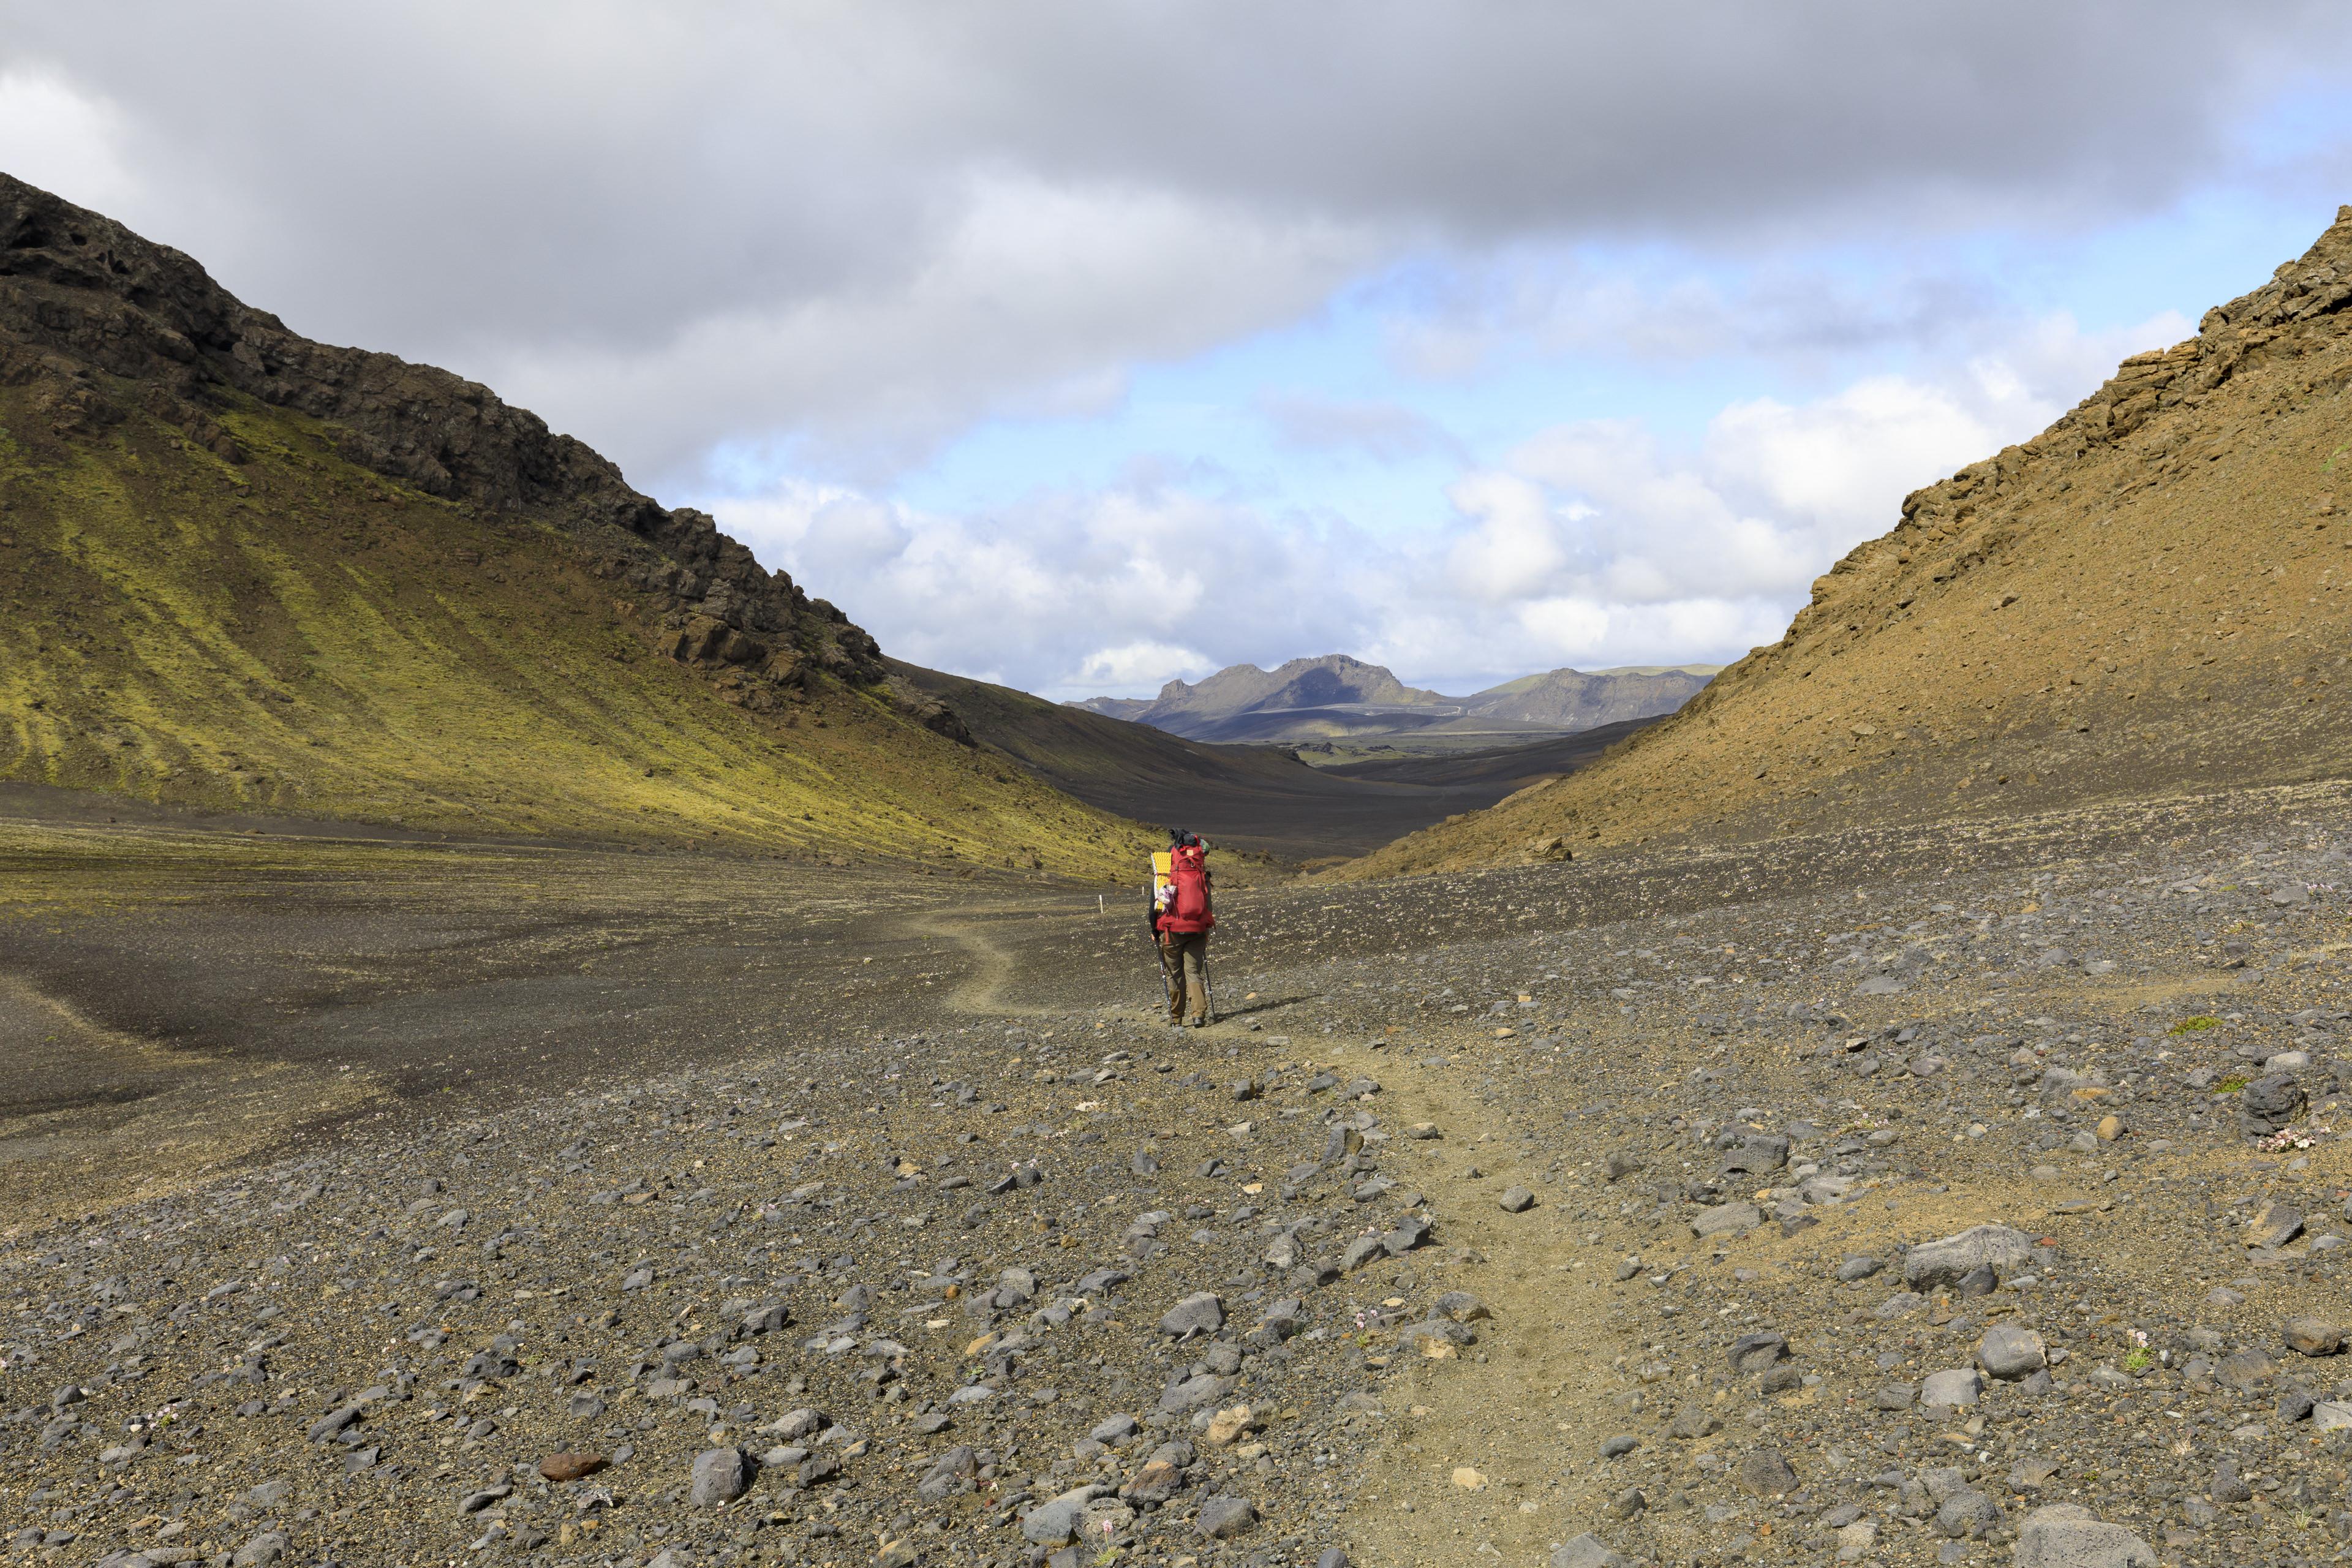 Elisabeth beim Abstieg vom Pass Lambaskarð,©Markus Proske—Canon EOS 5D Mark IV, EF16-35mm f/4L IS USM, 35mm, 1/250s, Blende 11, ISO 200